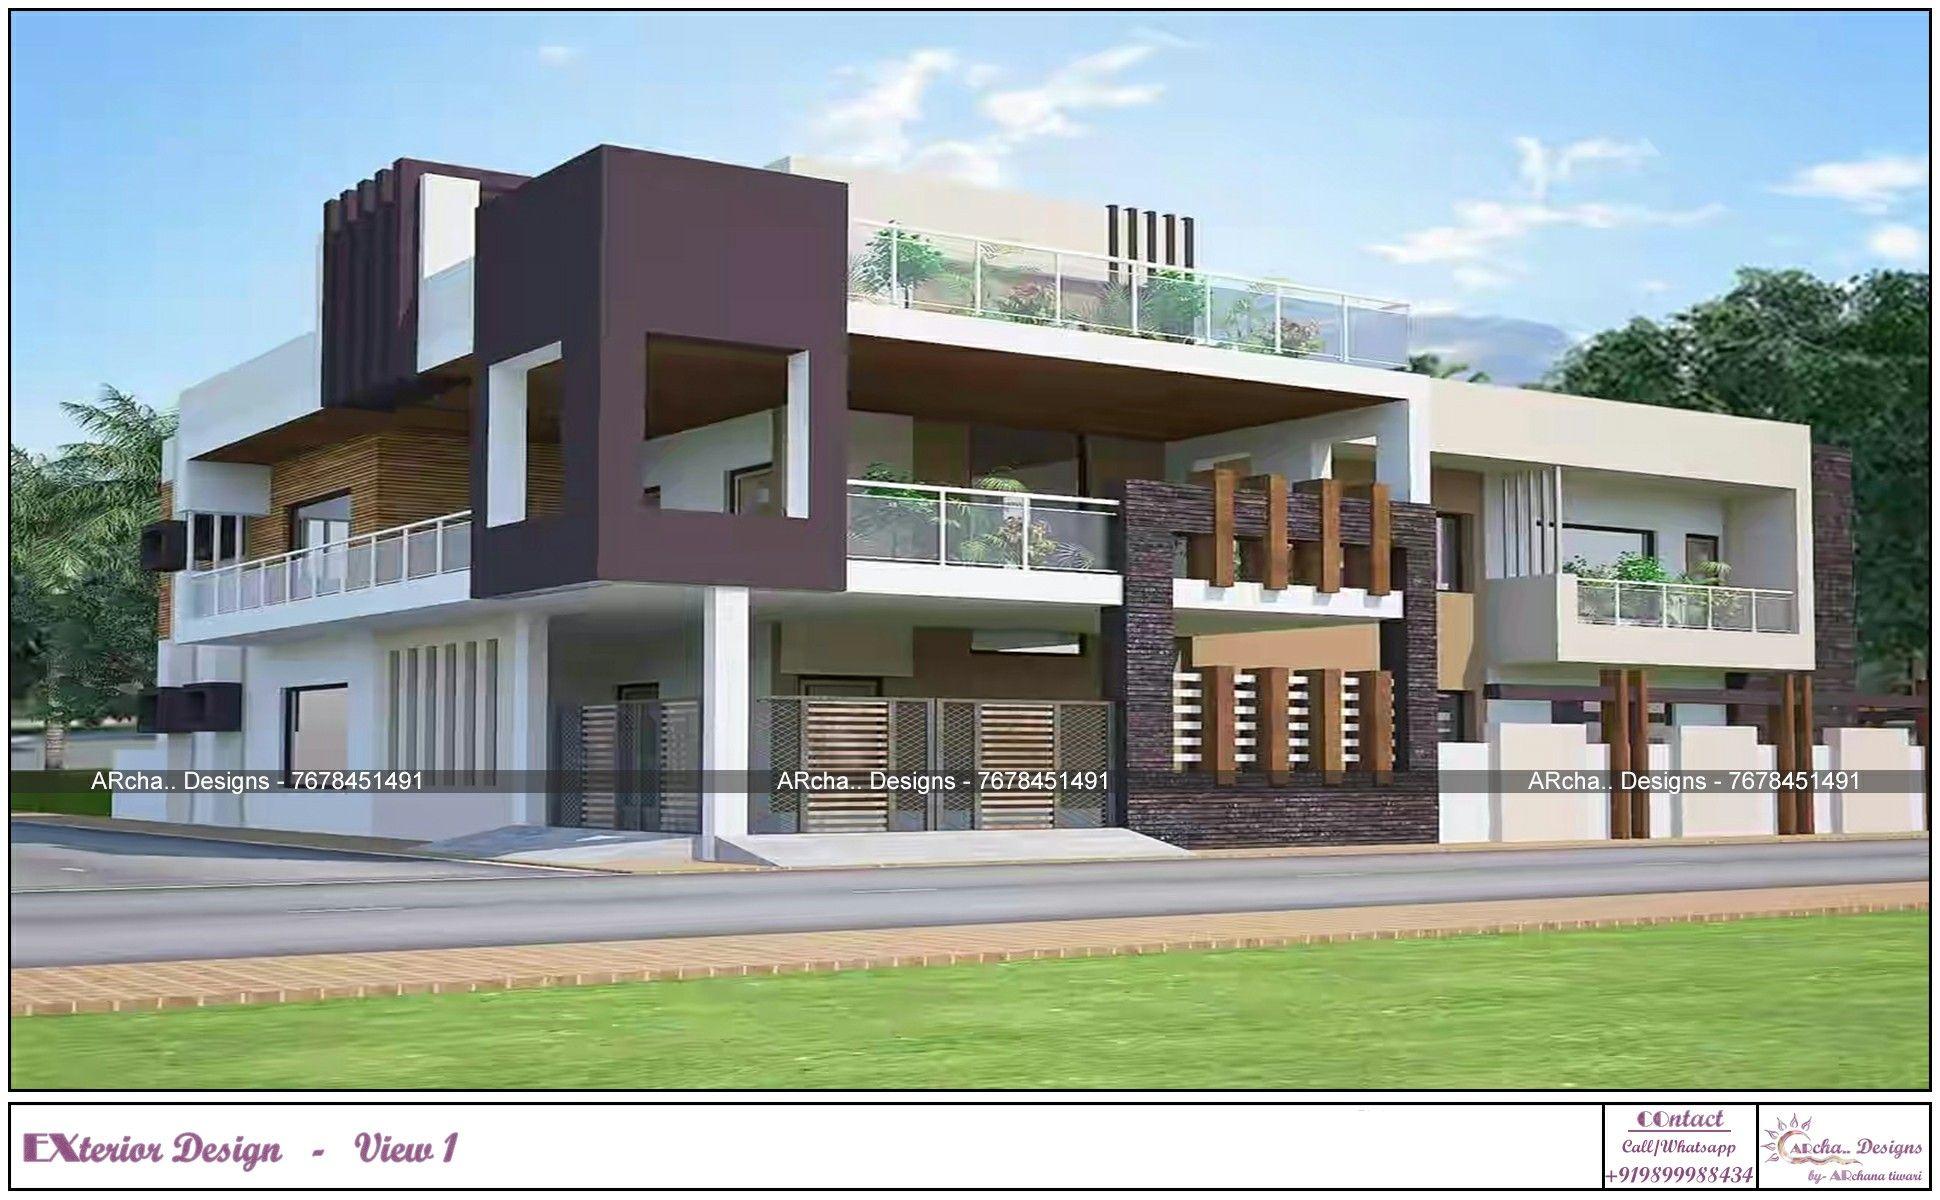 Exterior Design By Archa Designs